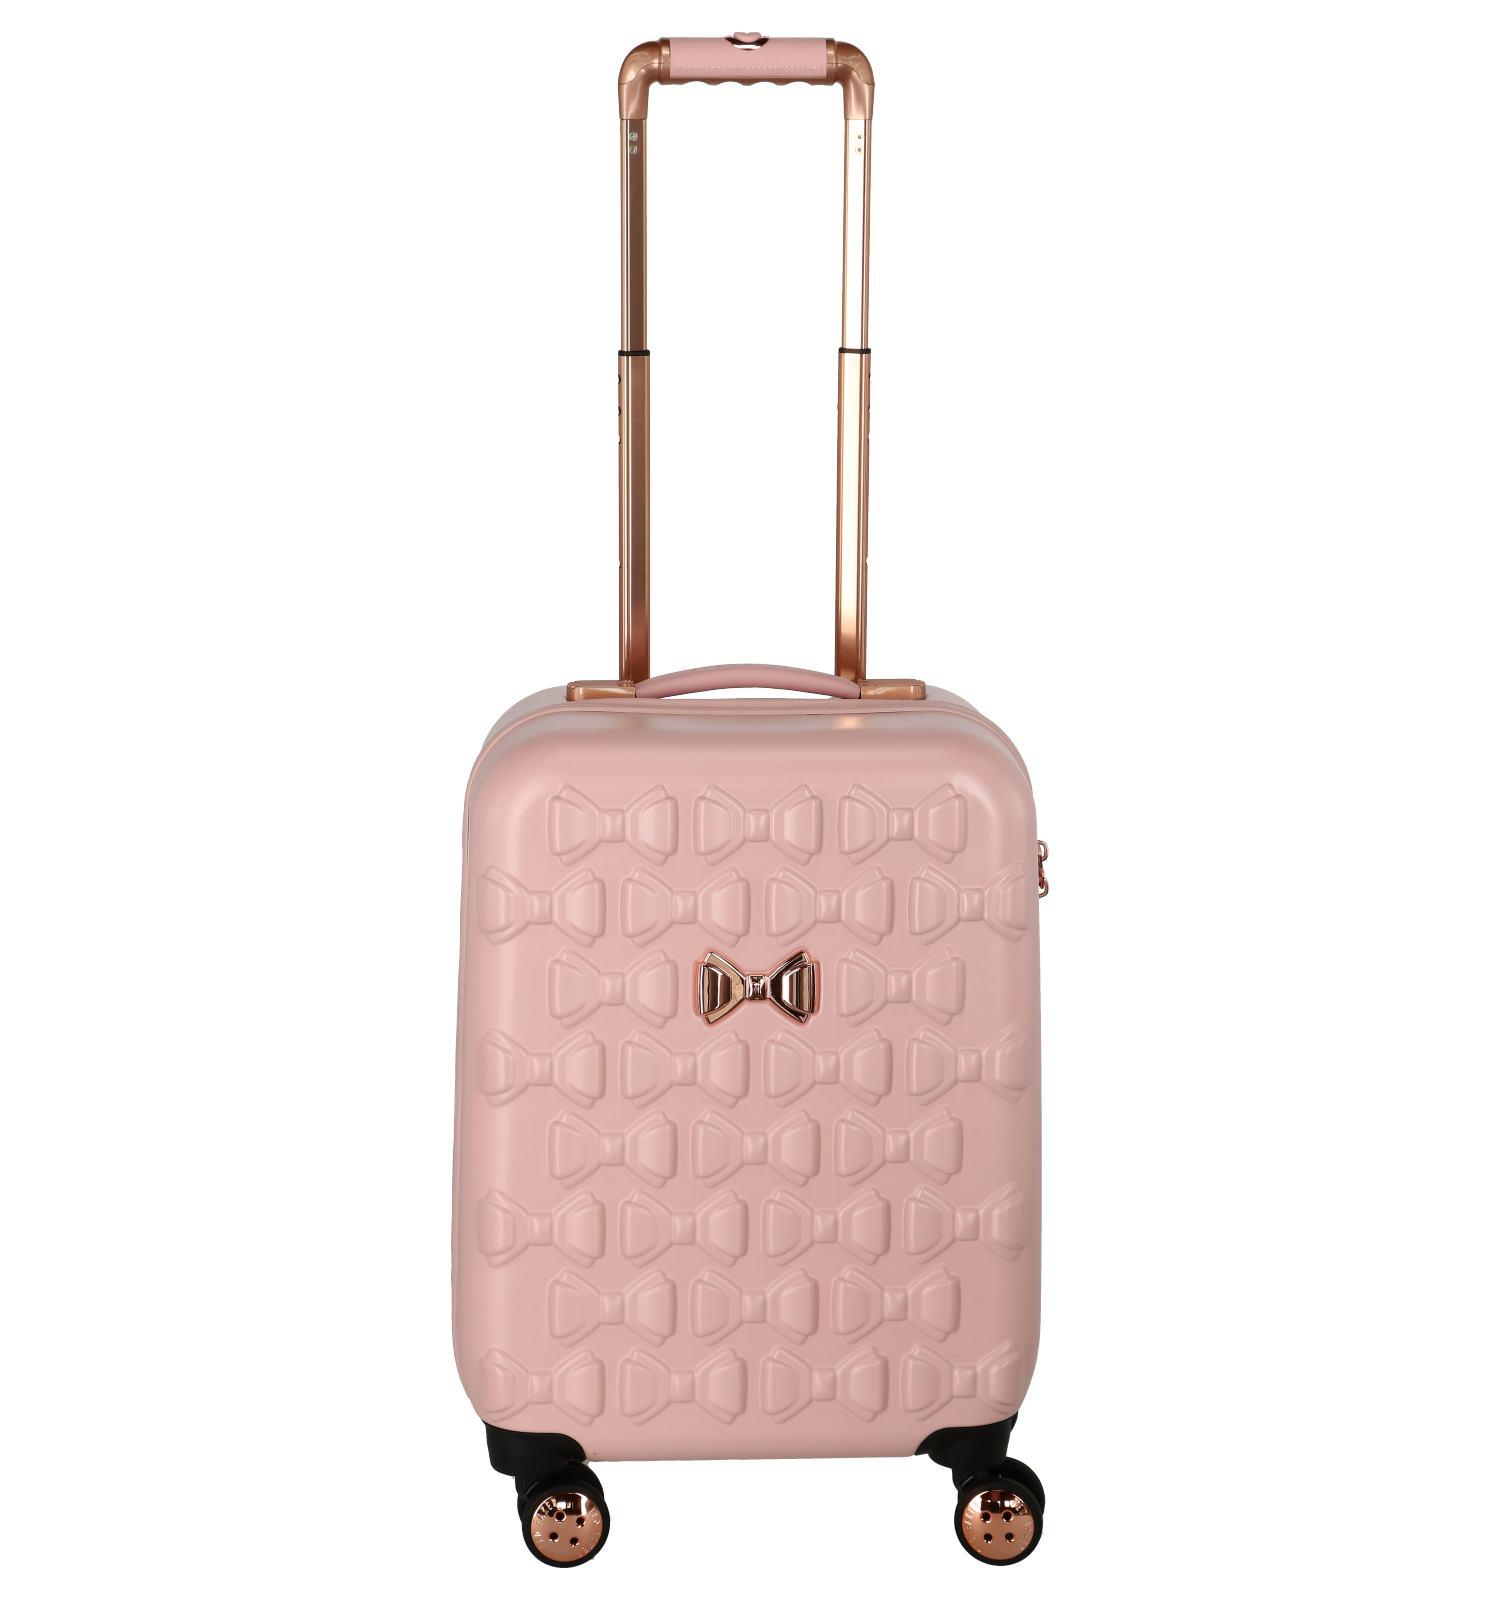 8711c901800 Roze Trolley Ted Baker - beautycase apart verkrijgbaar art. 227325    TORFS.BE   Gratis verzend en retour